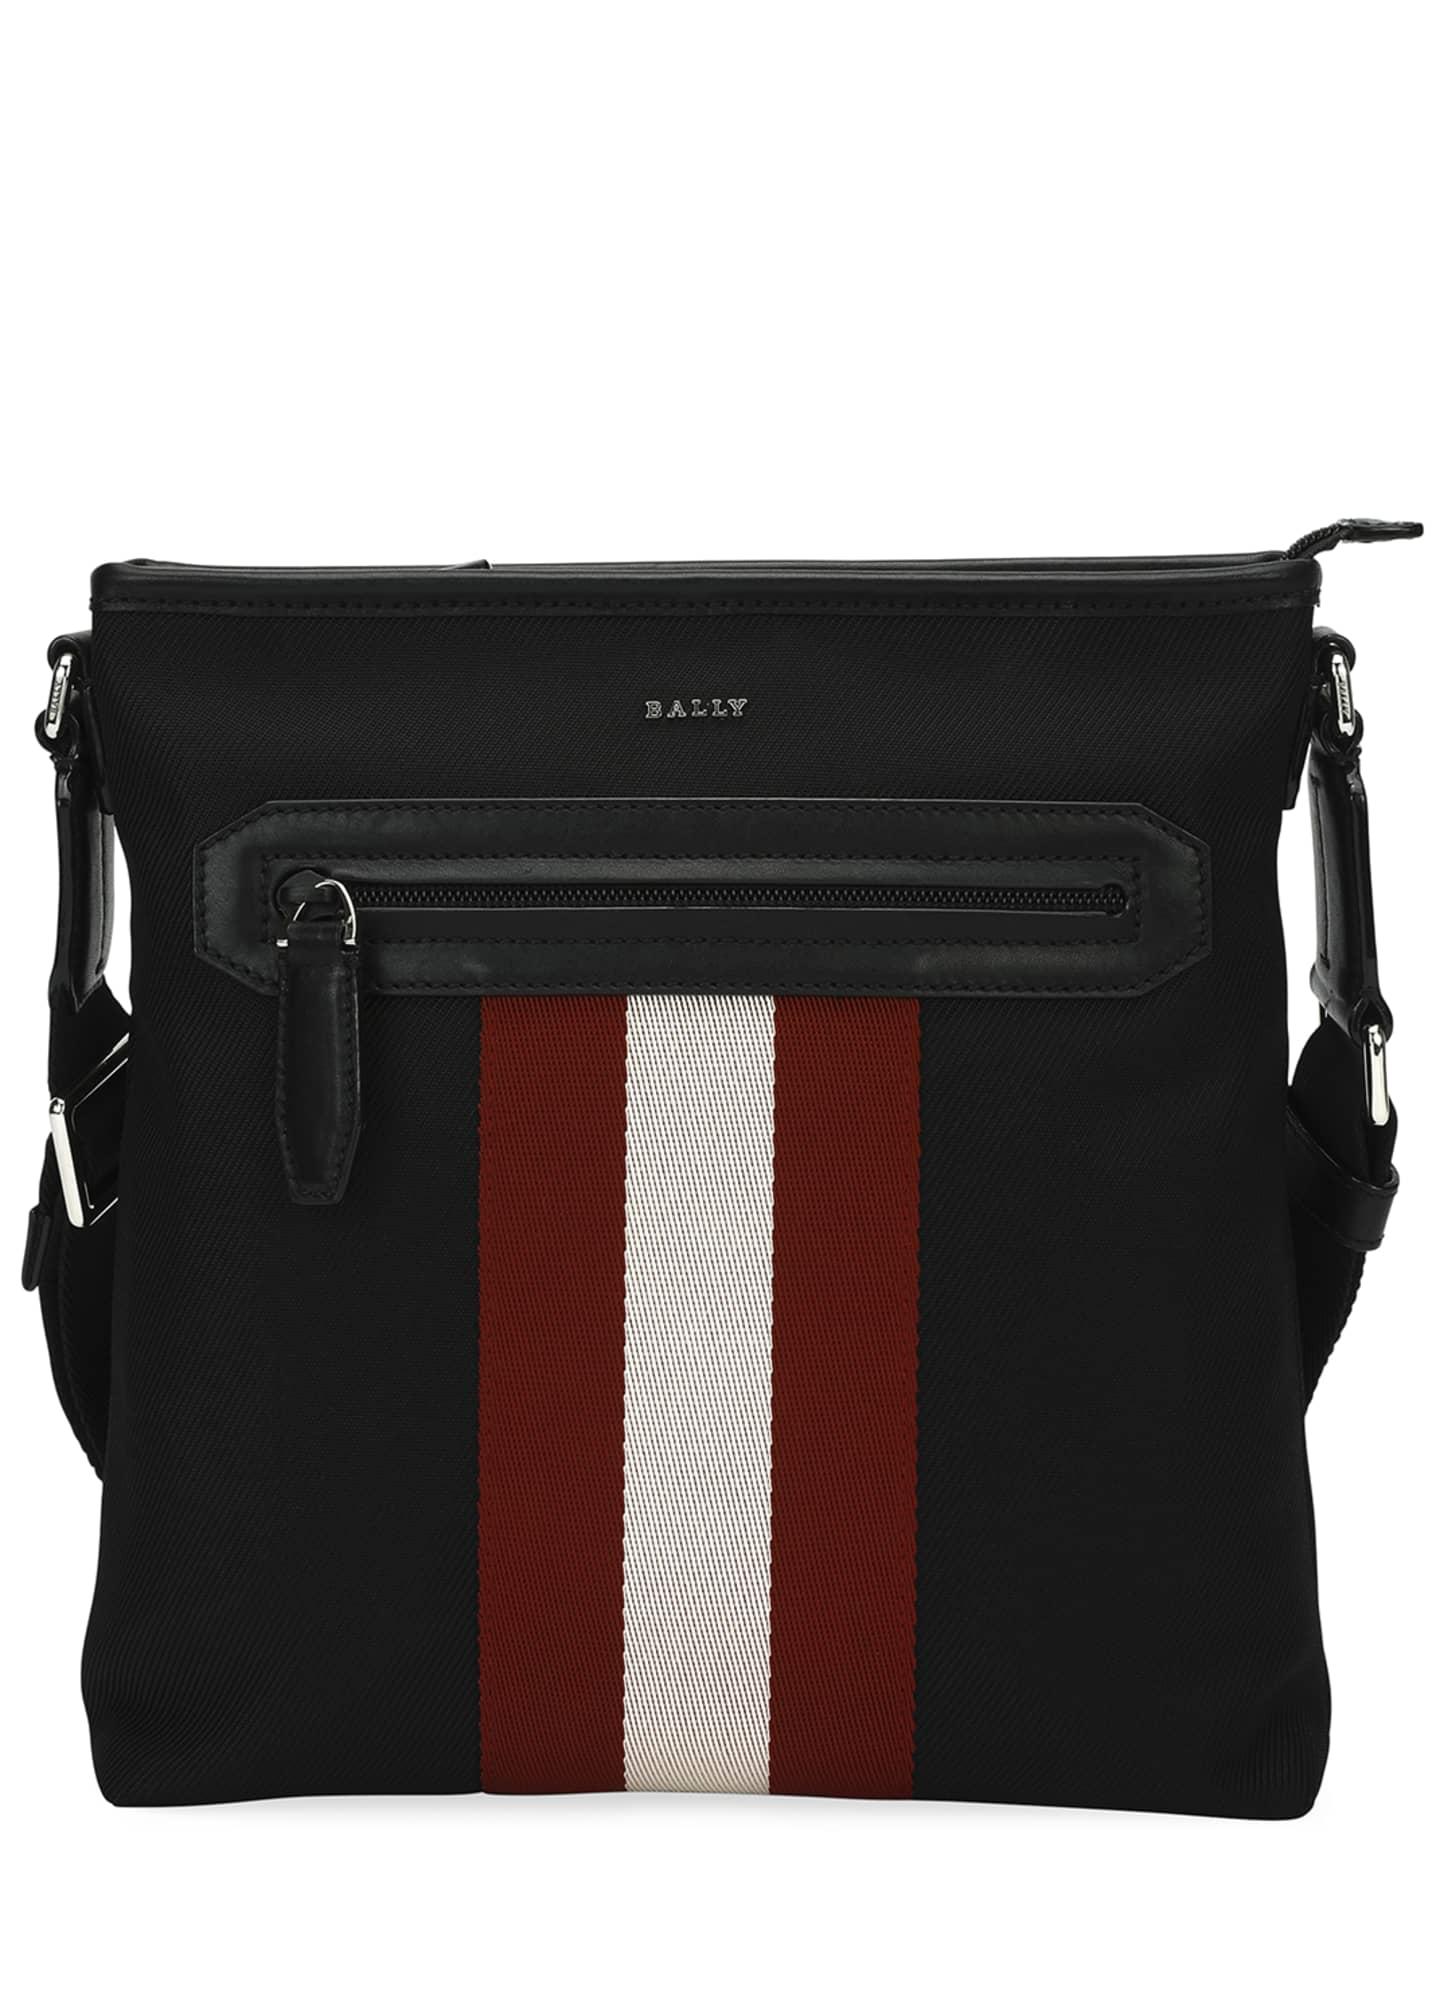 Bally Currios Trainspotting Knit Crossbody Bag